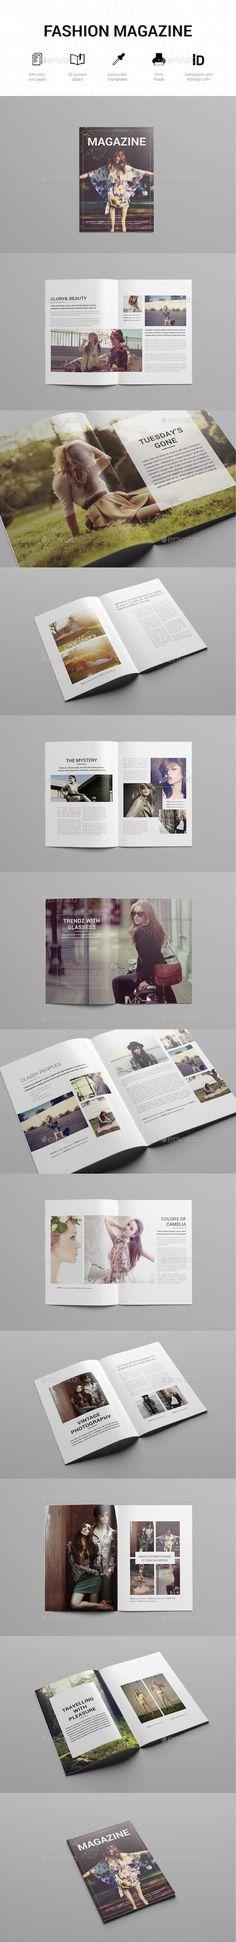 Minimal Fashion Magazine Template | #magazinetemplate | Download: http://graphicriver.net/item/minimal-fashion-magazine-template/10028651?ref=ksioks